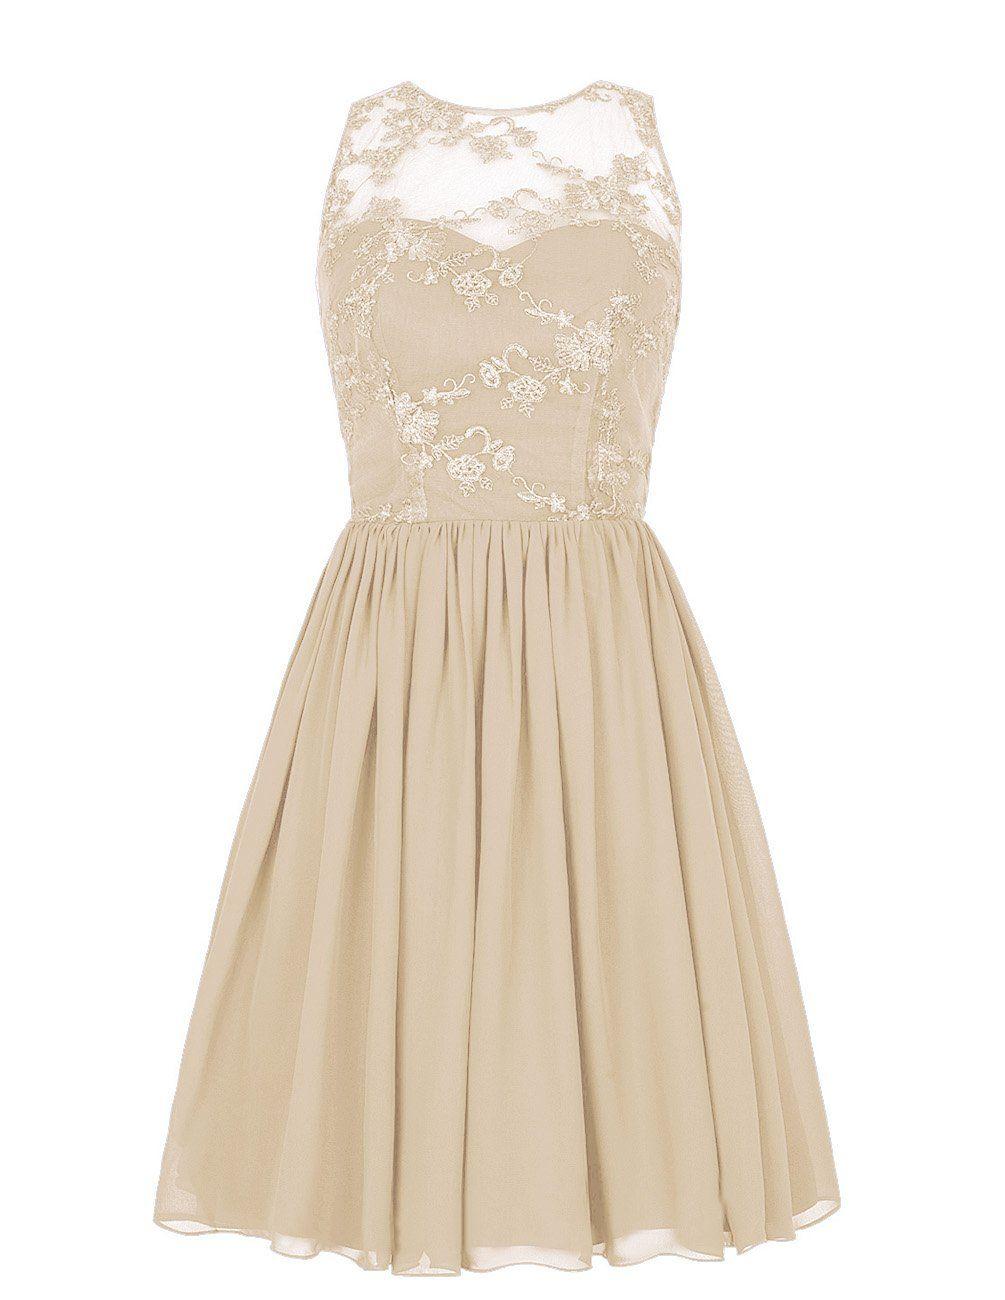 Robot Check Tan Bridesmaid Dresses Chiffon Cocktail Dress Pretty Dresses [ 1300 x 1005 Pixel ]